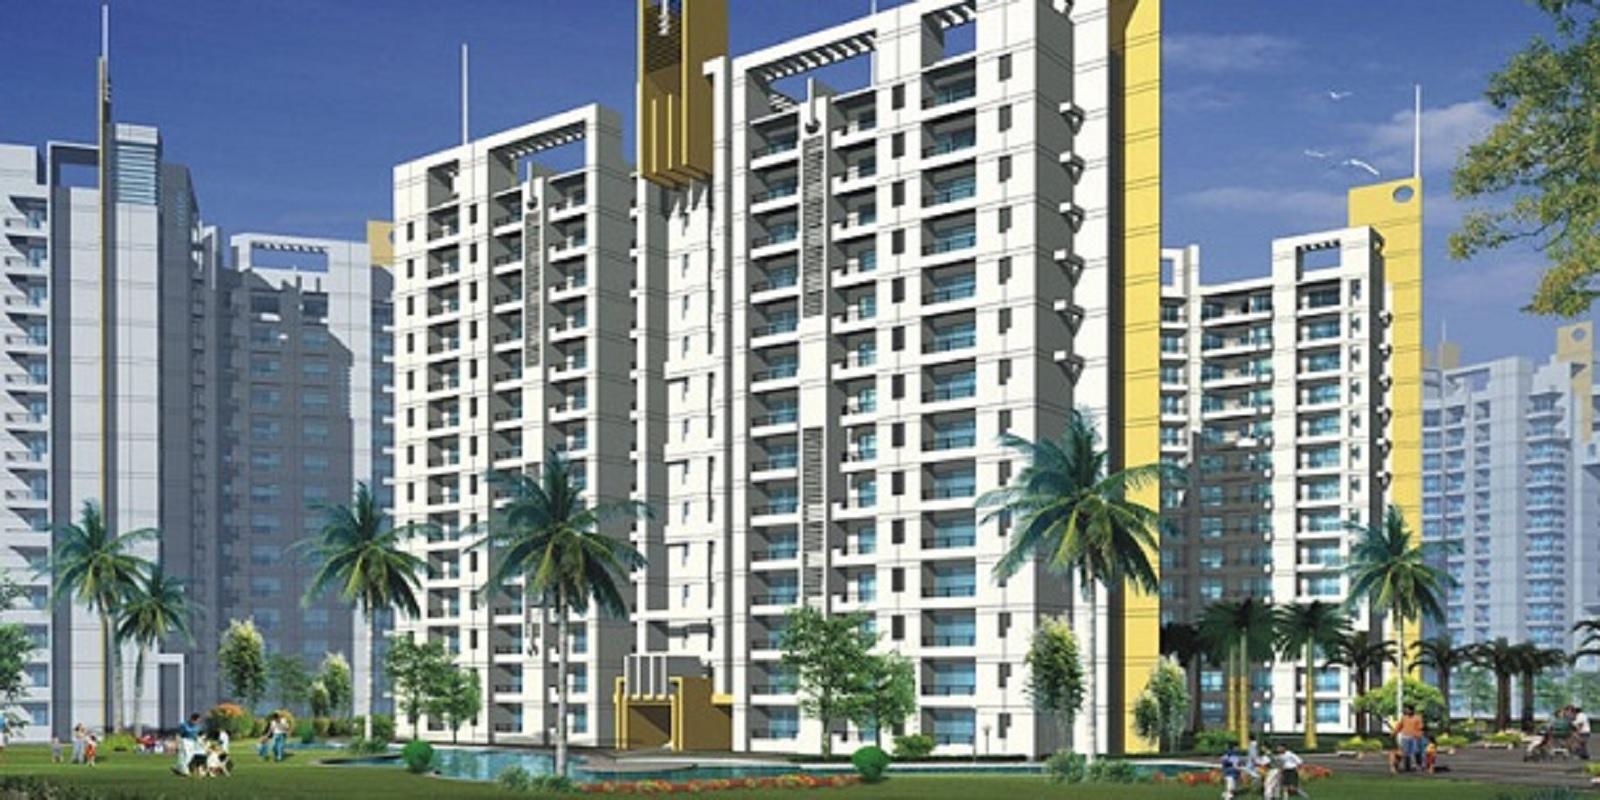 gaur city 6th avenue project large image4